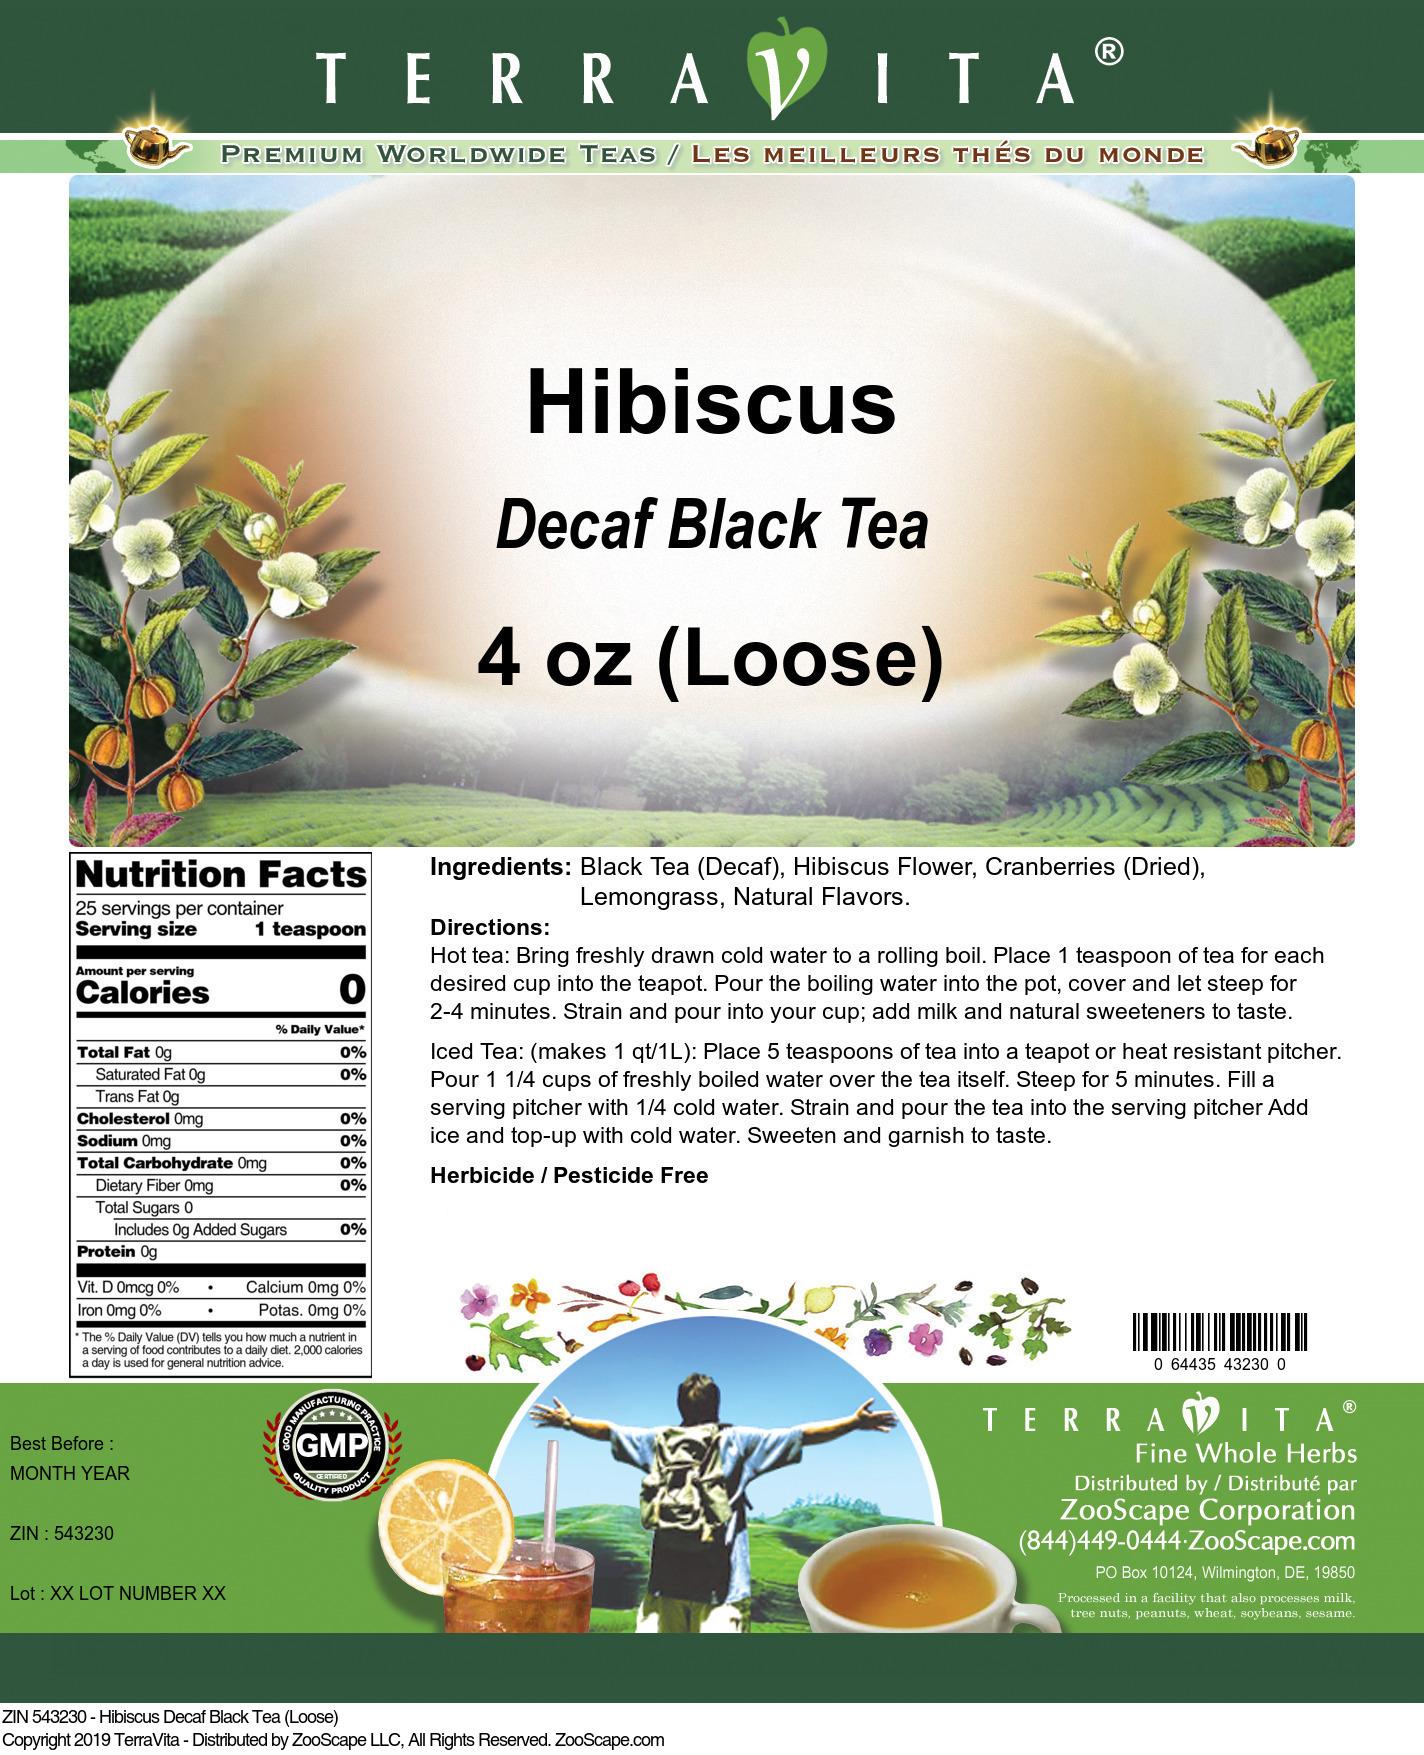 Hibiscus Decaf Black Tea (Loose)